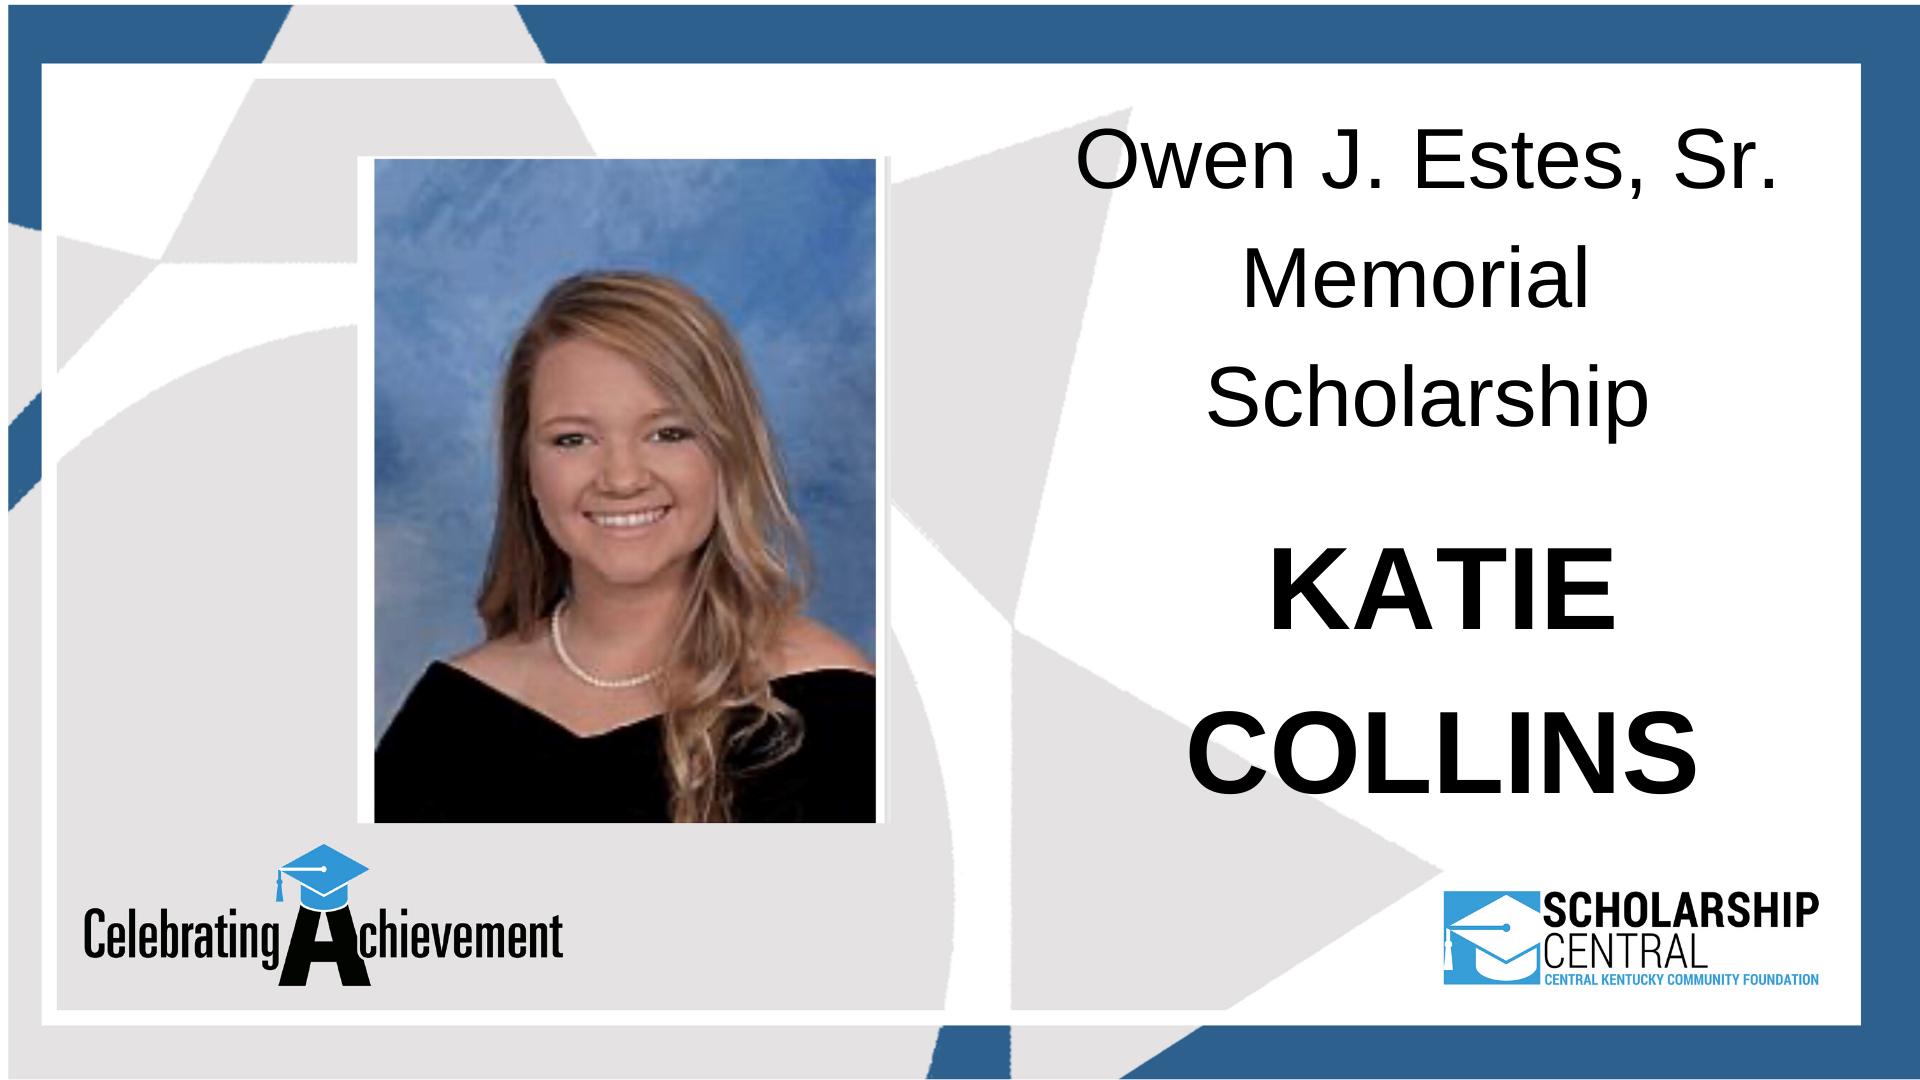 Owen J Estes Sr Scholarship